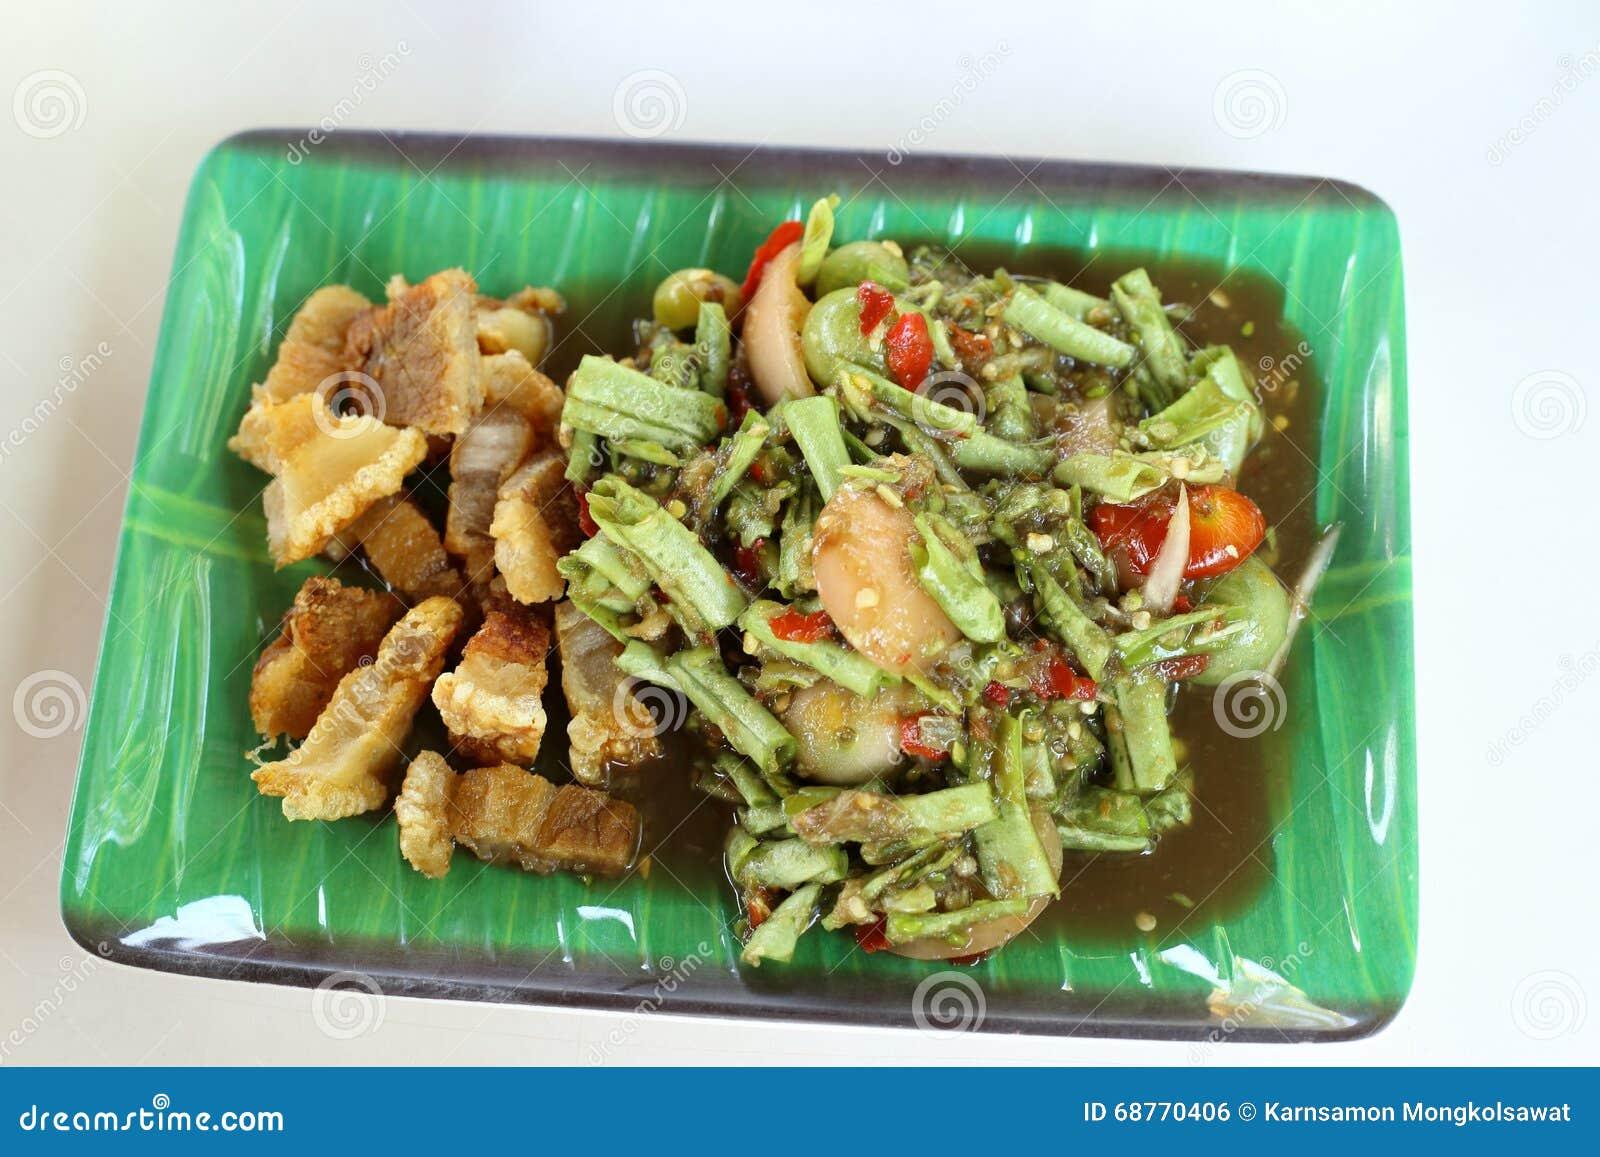 Long Bean Spicy Salad with Crispy fried streaky pork recipe